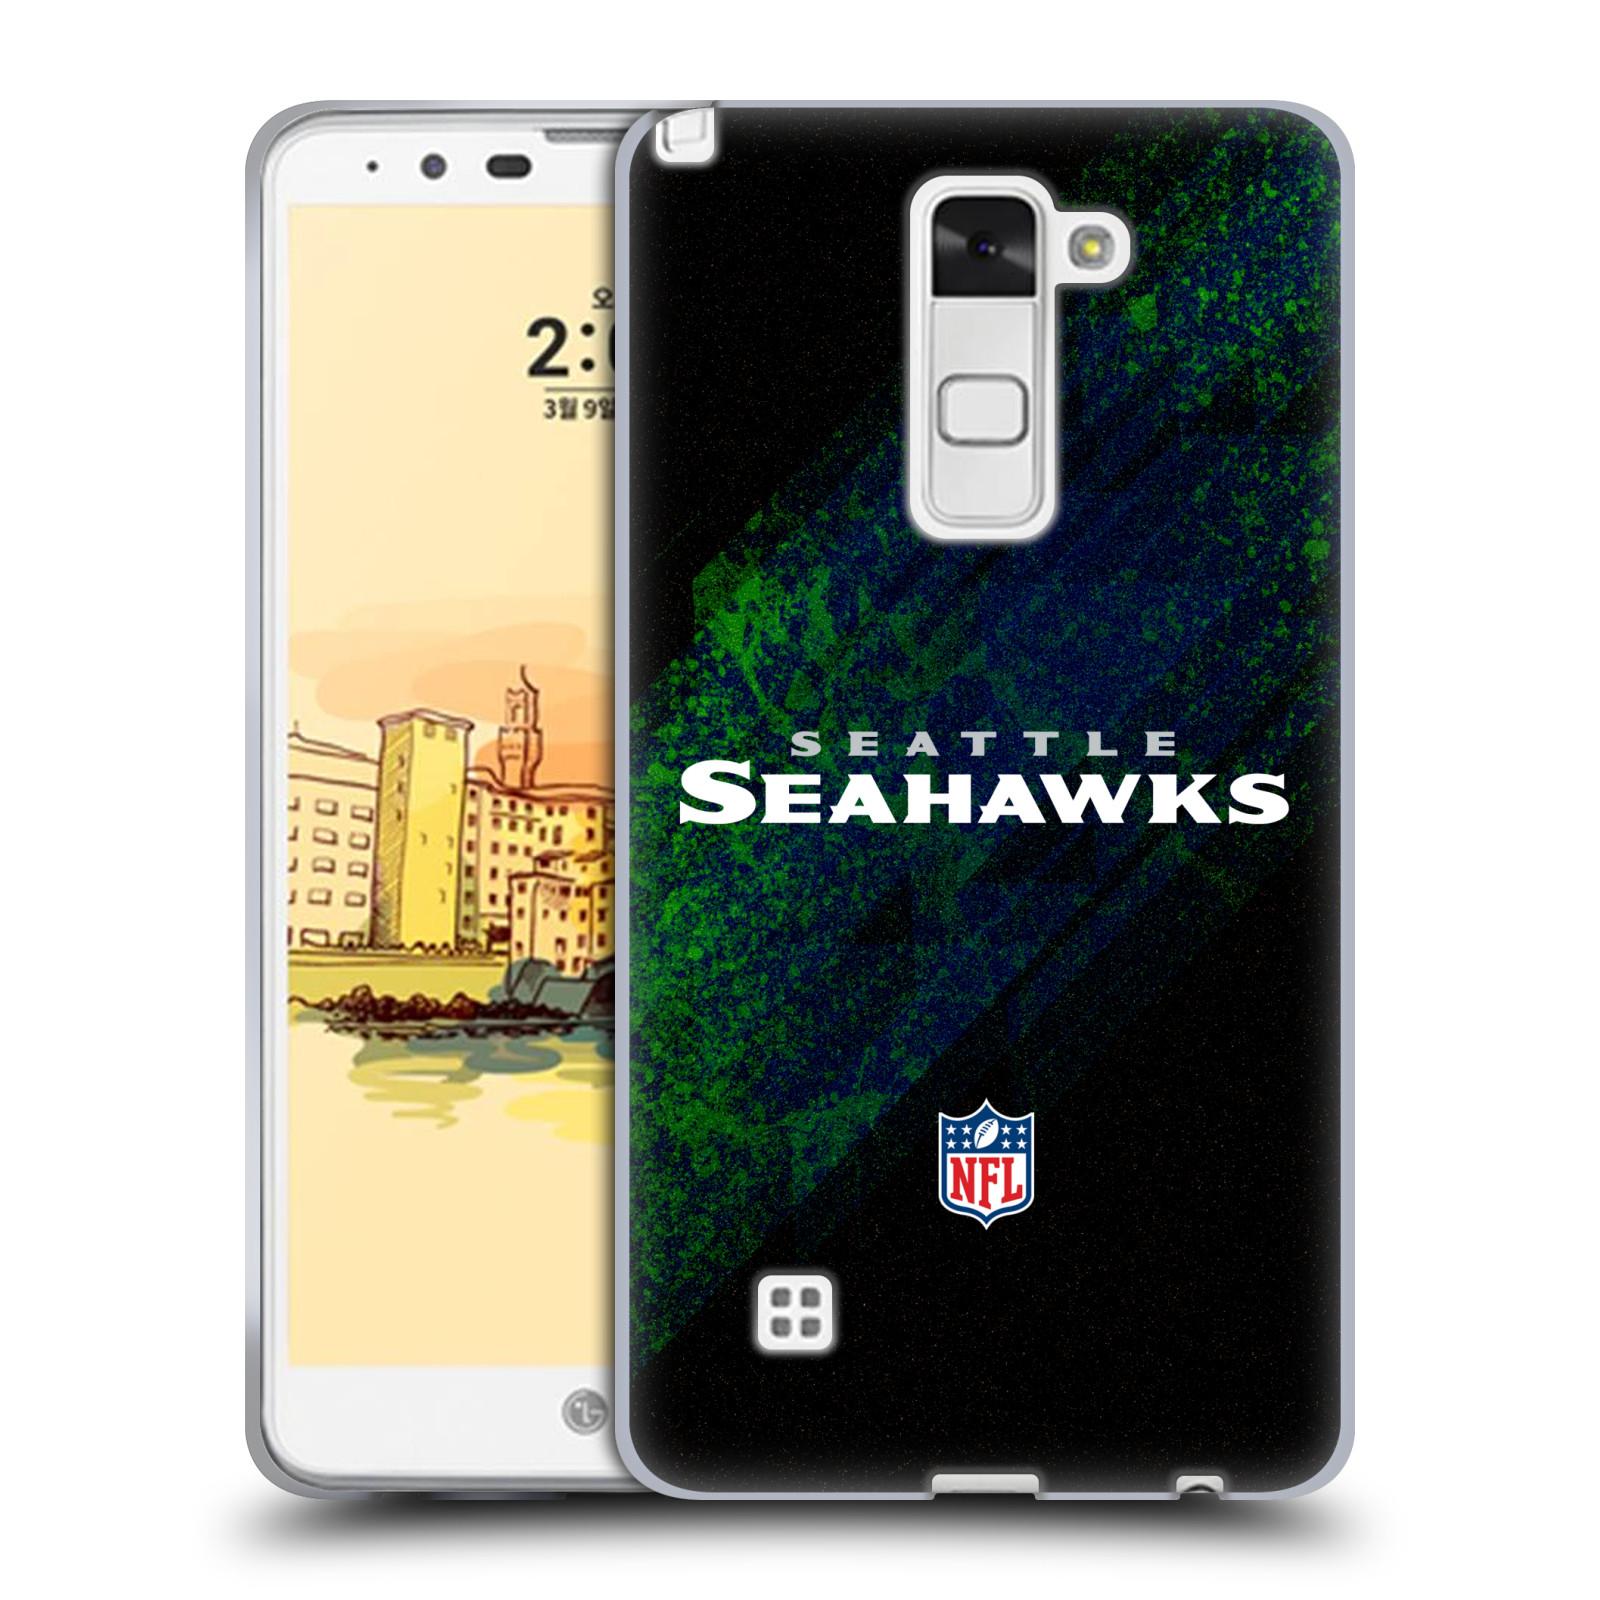 OFFICIAL NFL SEATTLE SEAHAWKS LOGO SOFT GEL CASE FOR LG PHONES 3